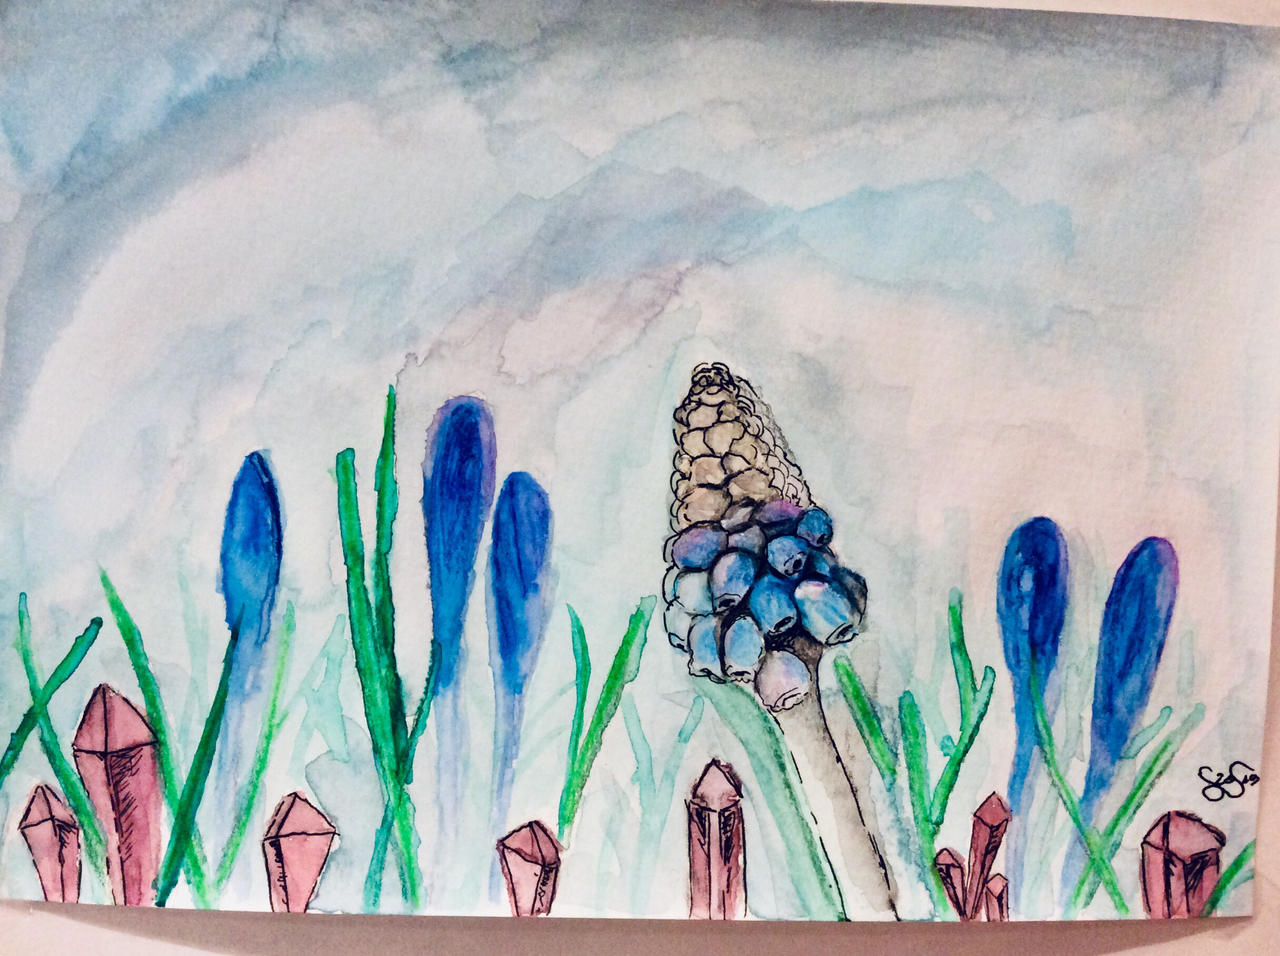 Random watercolor flower scene